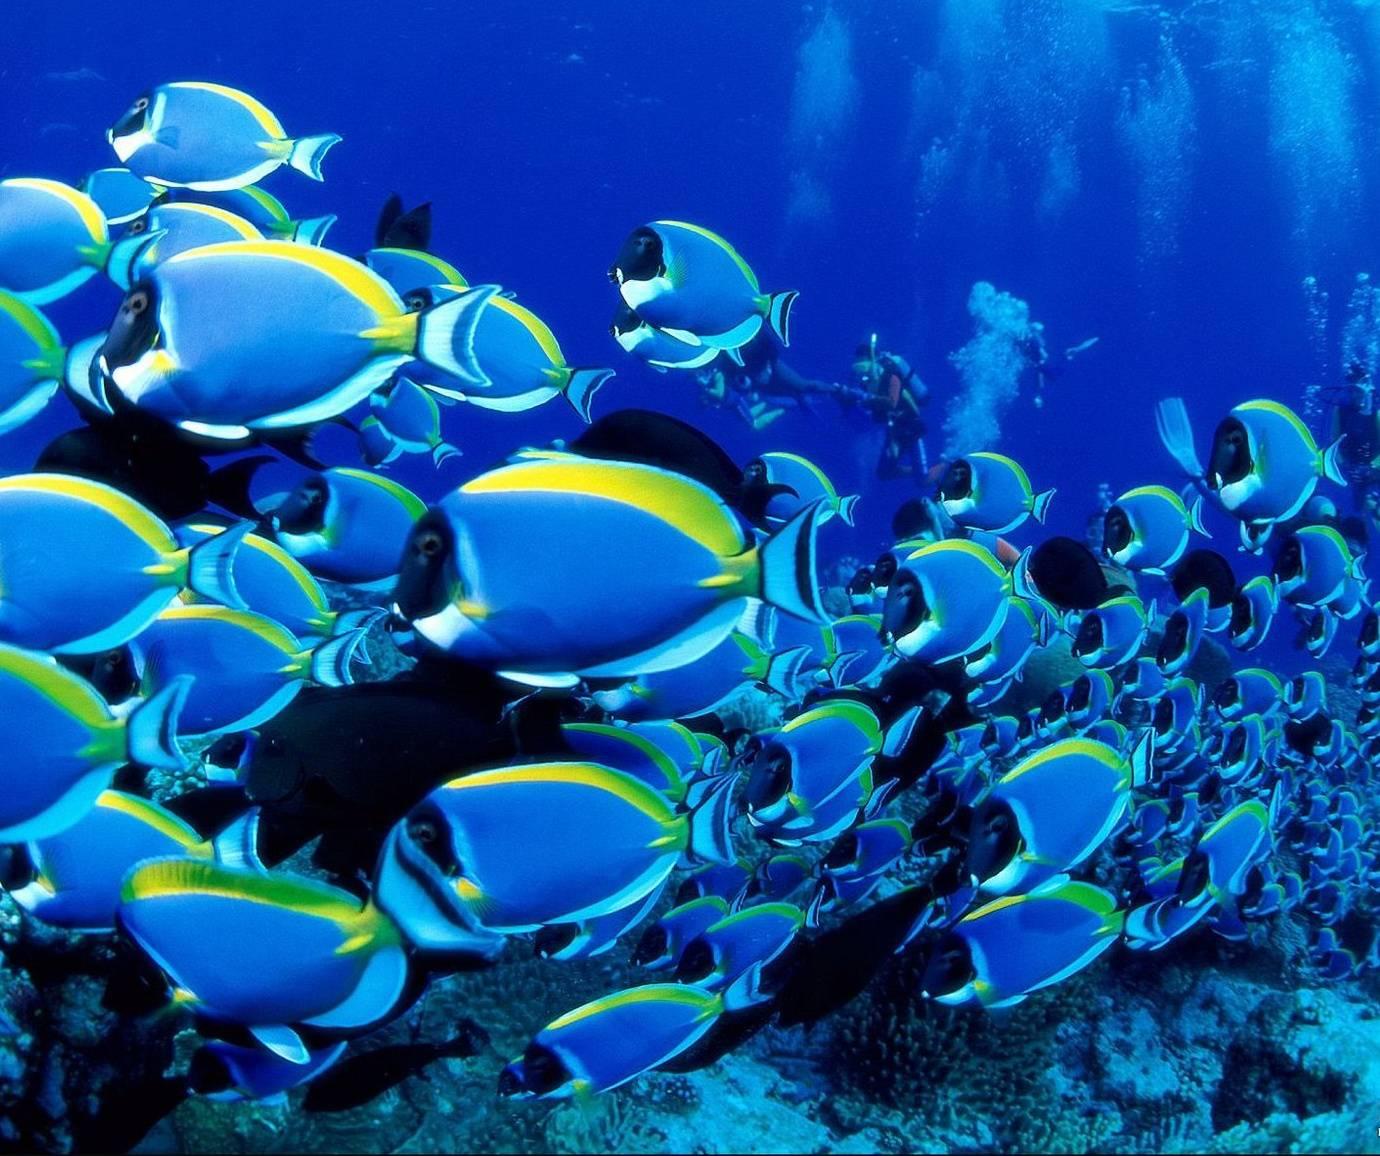 Ocean Life Wallpaper By Nology Aa Free On Zedge